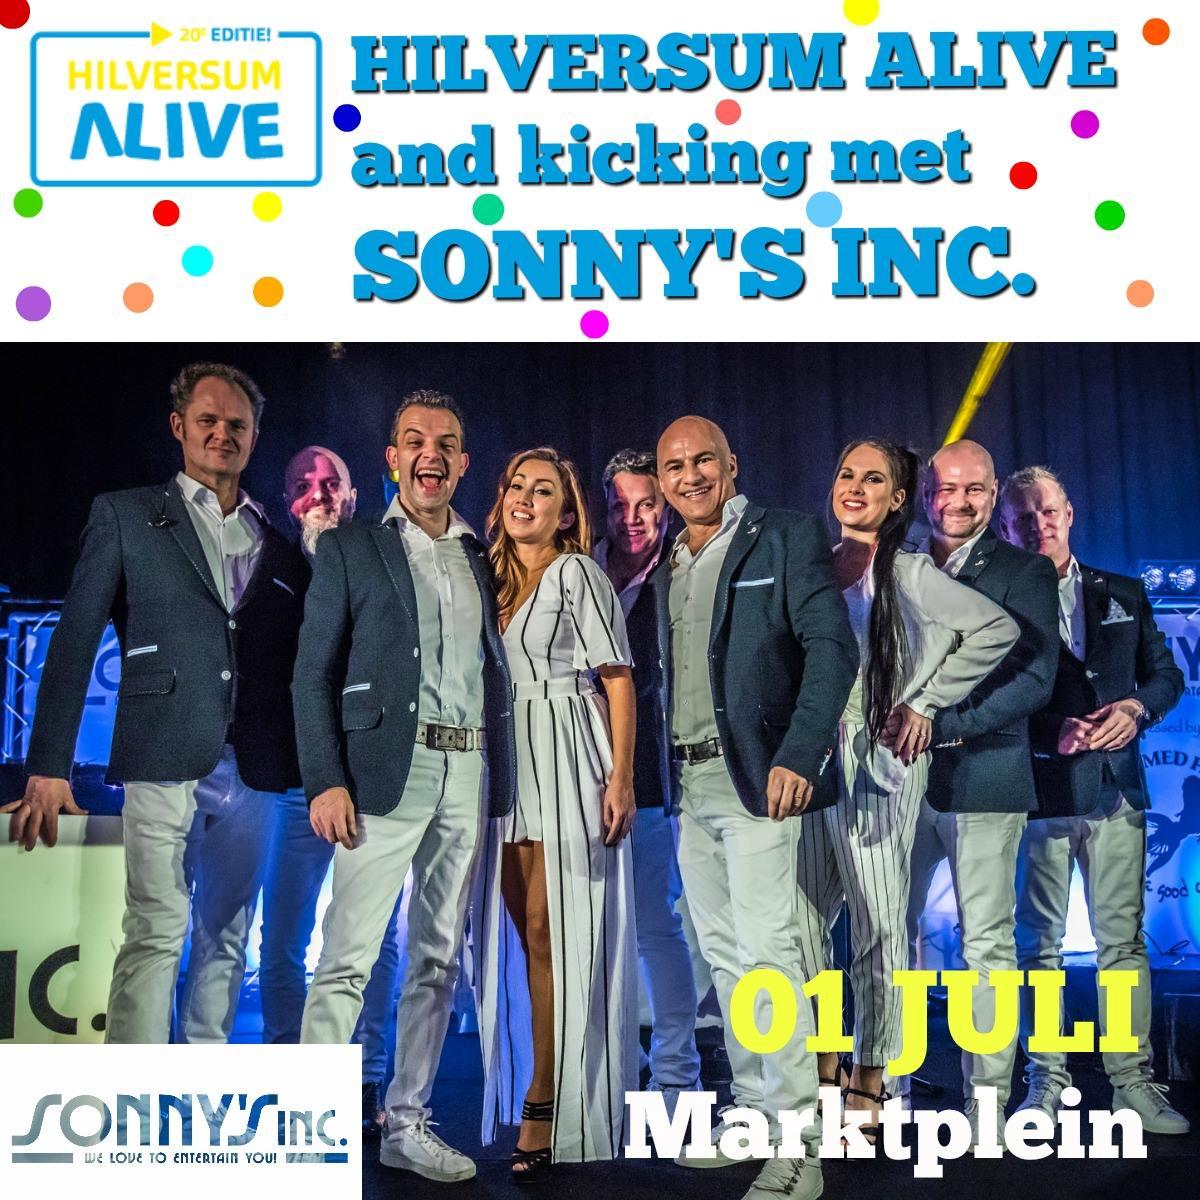 Hilversum Alive 2018